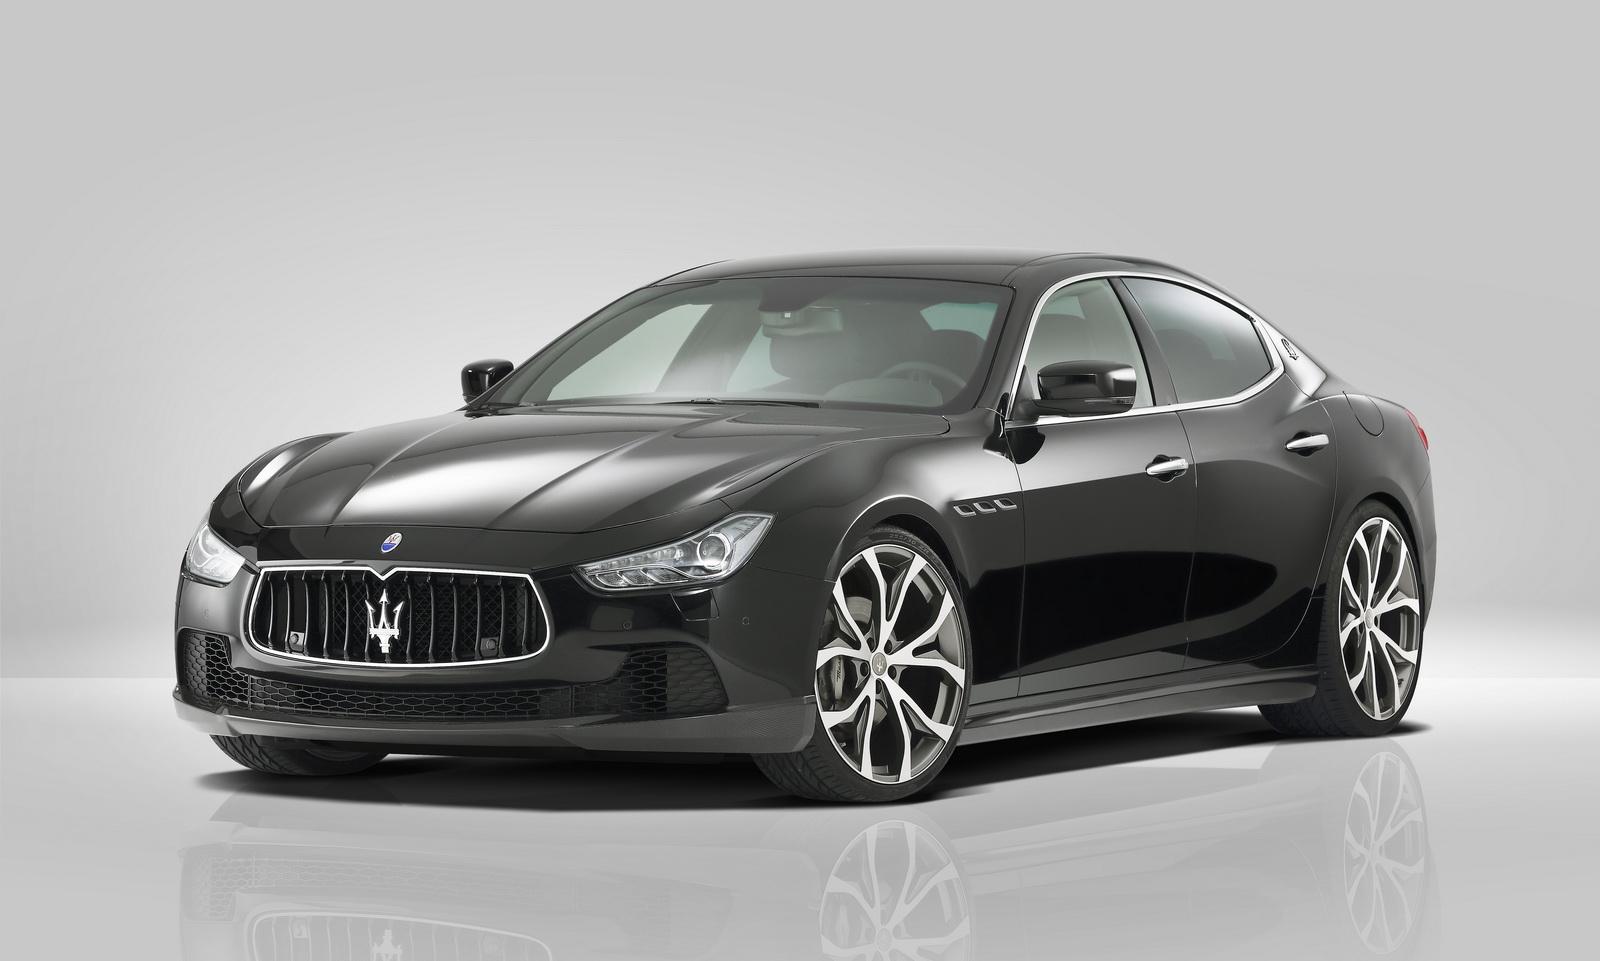 Maserati Ghibli S Q4 >> New Maserati Ghibli Power-Tuned by Novitec | Carscoops